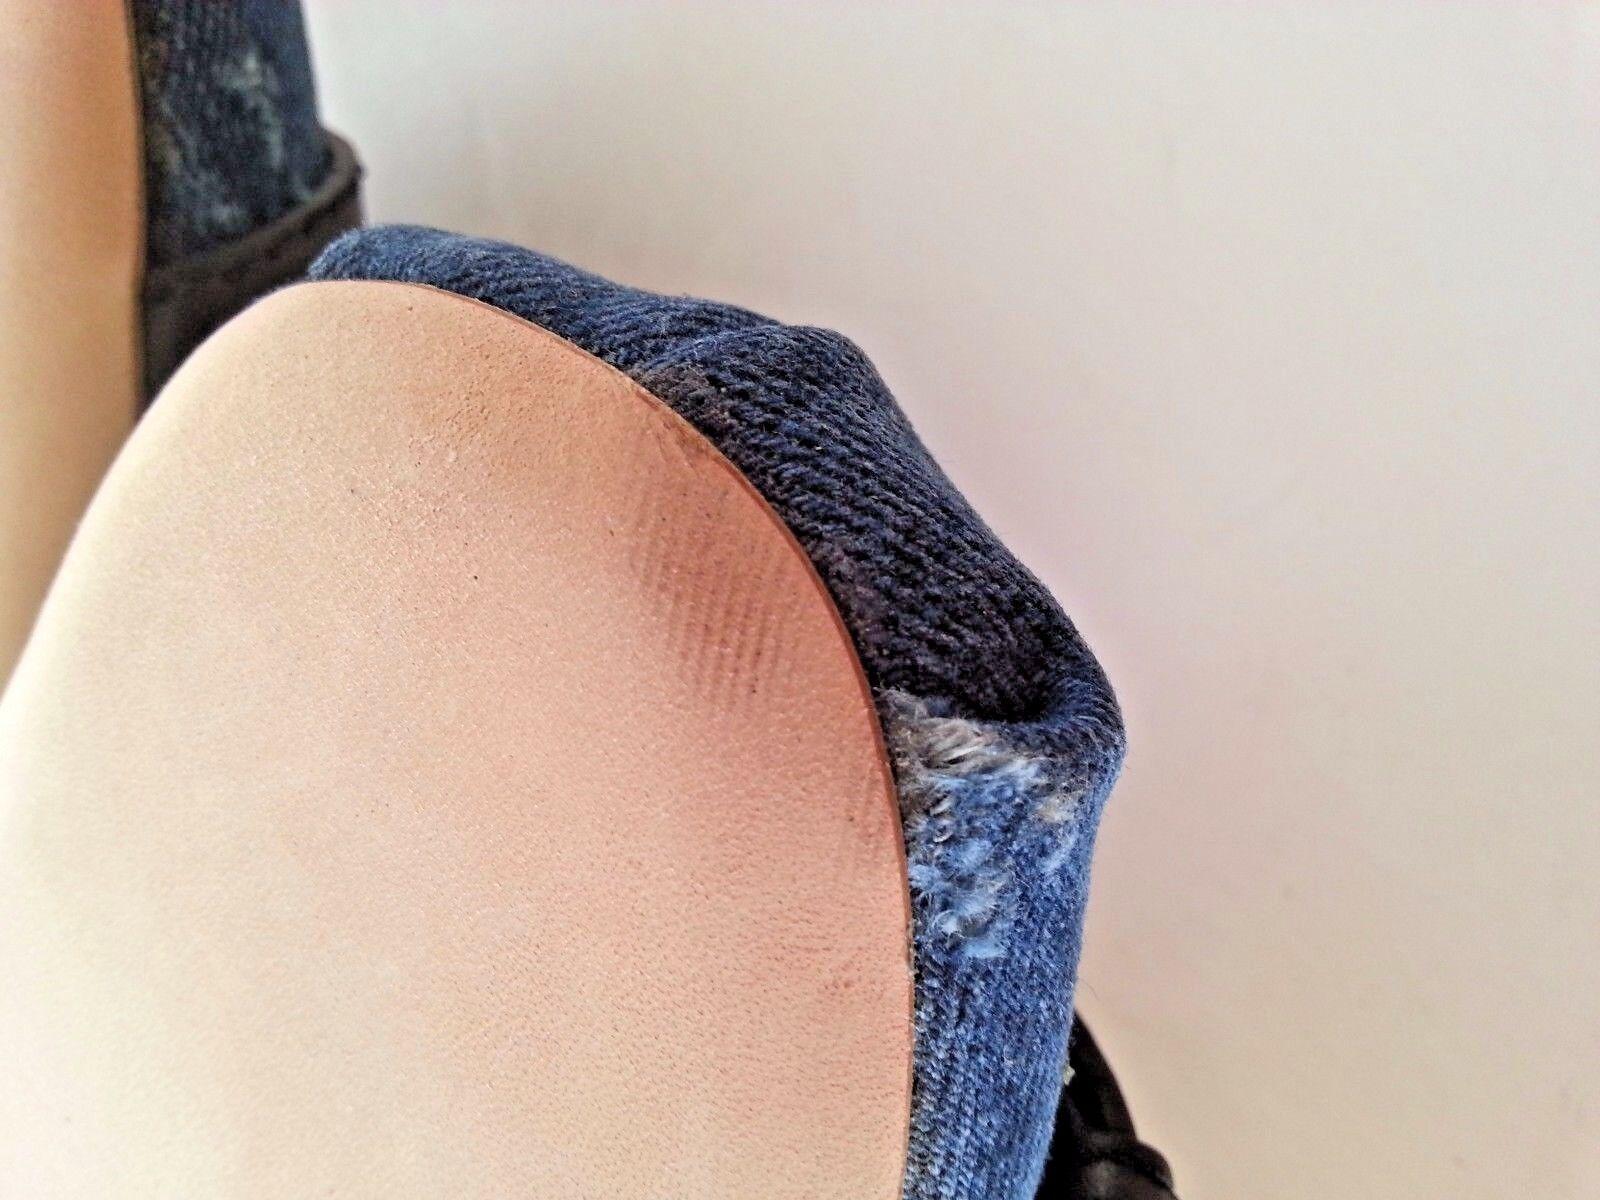 NEW MIU MIU by Prada    Denim Ankle Wrap Ribbon Slide Flats Mules shoes 35.5 5.5US 656a5d